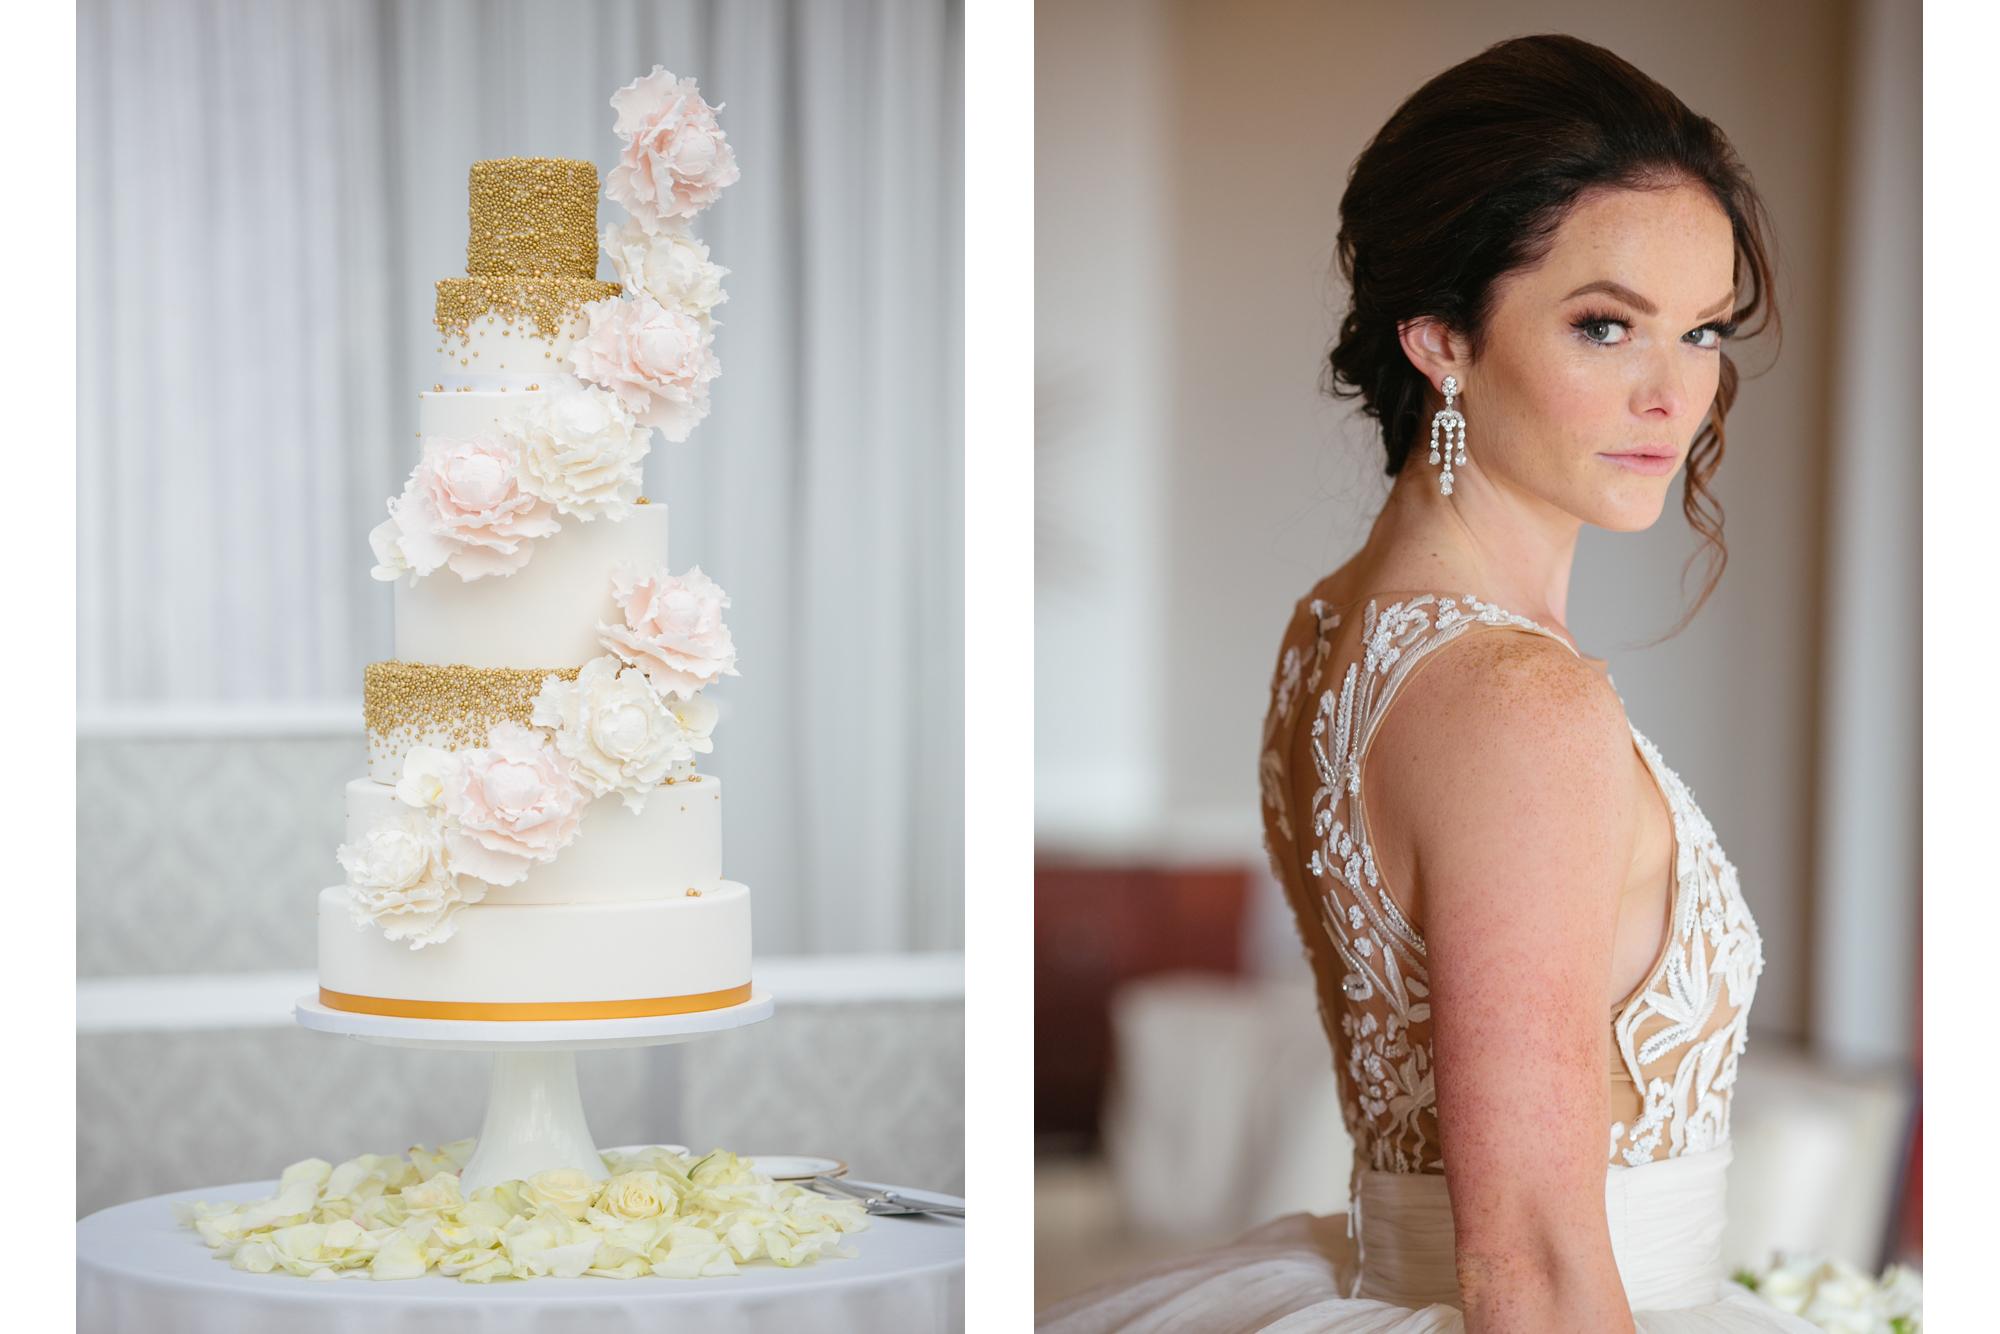 vancouver-luxury-wedding-photographer-lori-miles-21.jpg